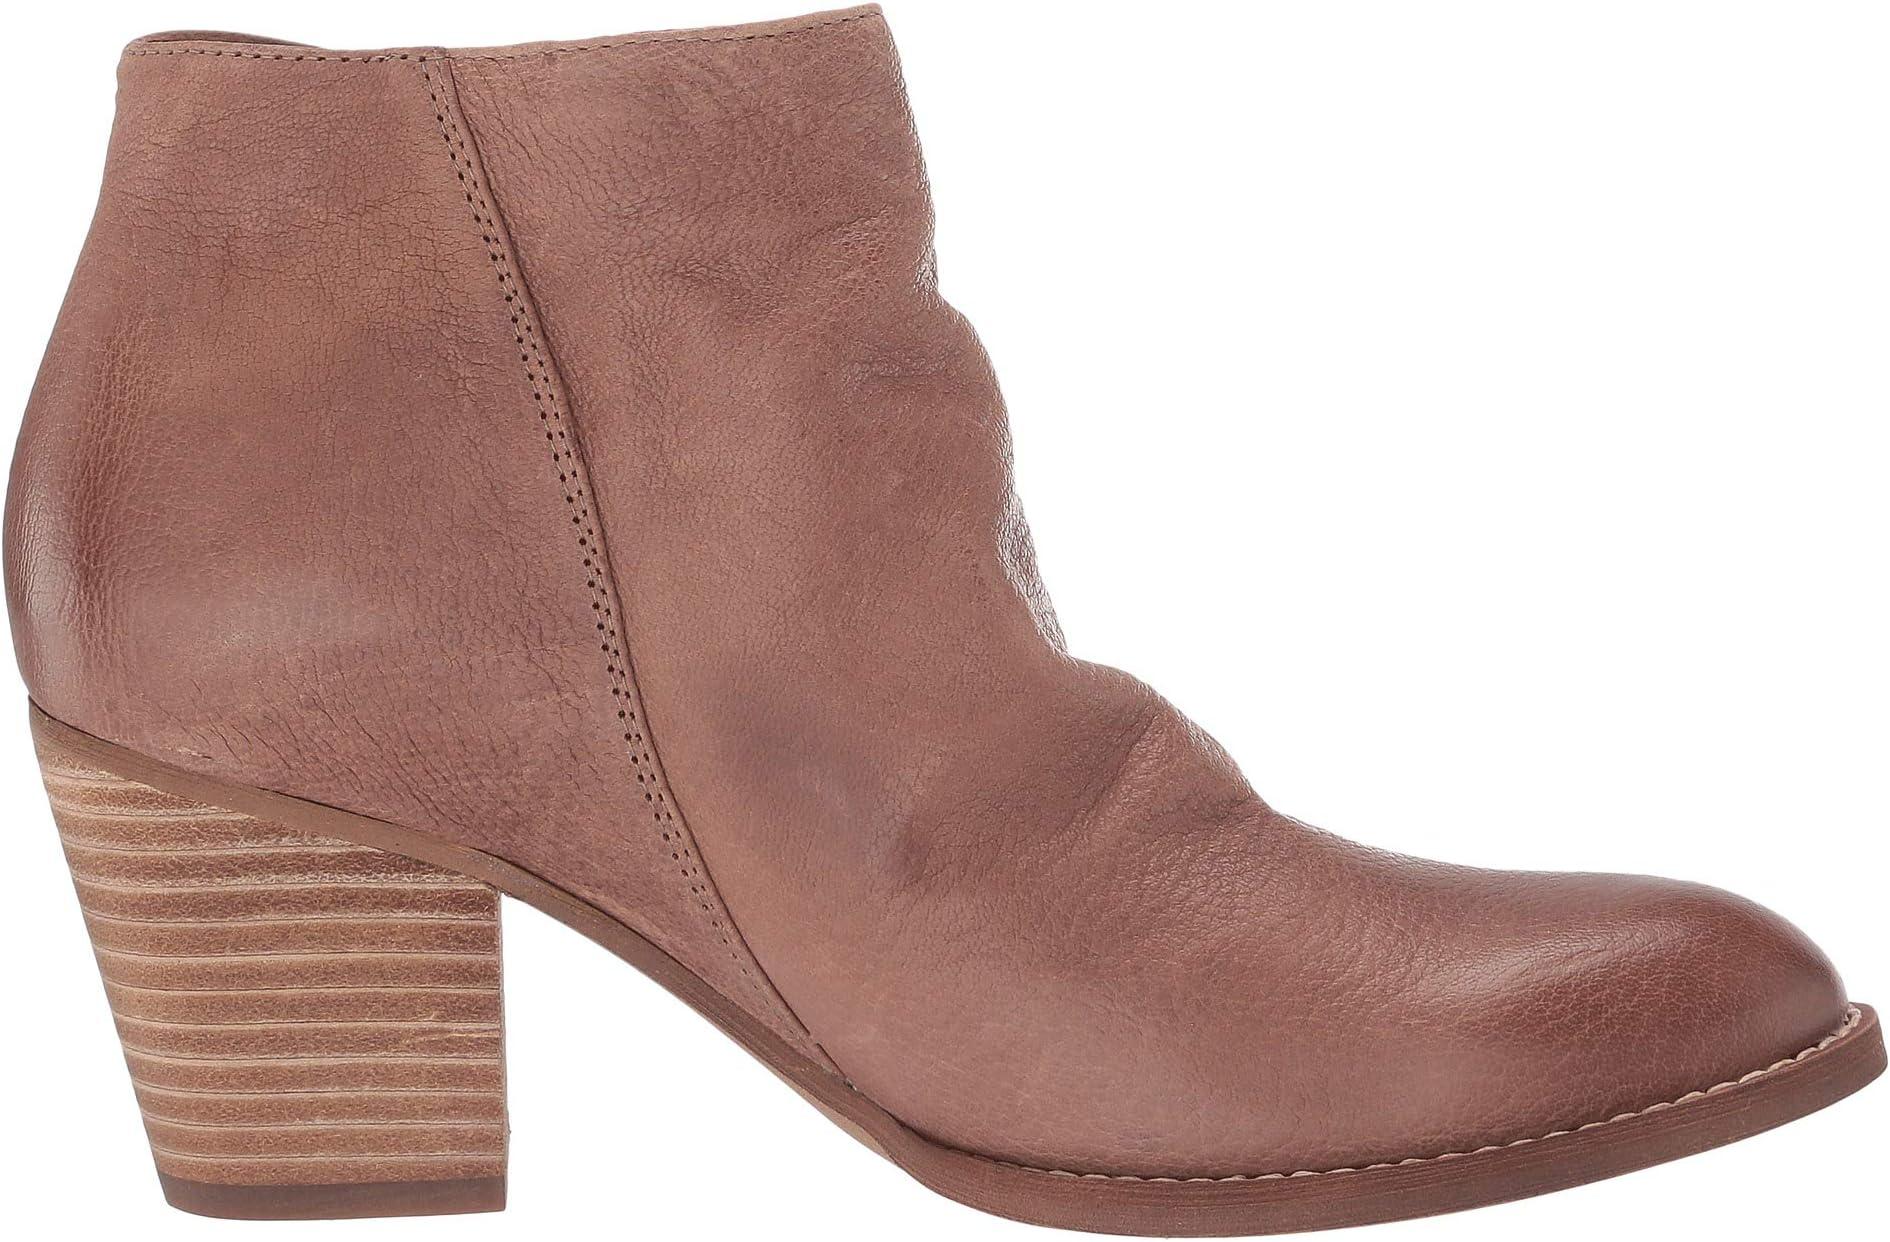 Sam Edelman Macon | Women's shoes | 2020 Newest